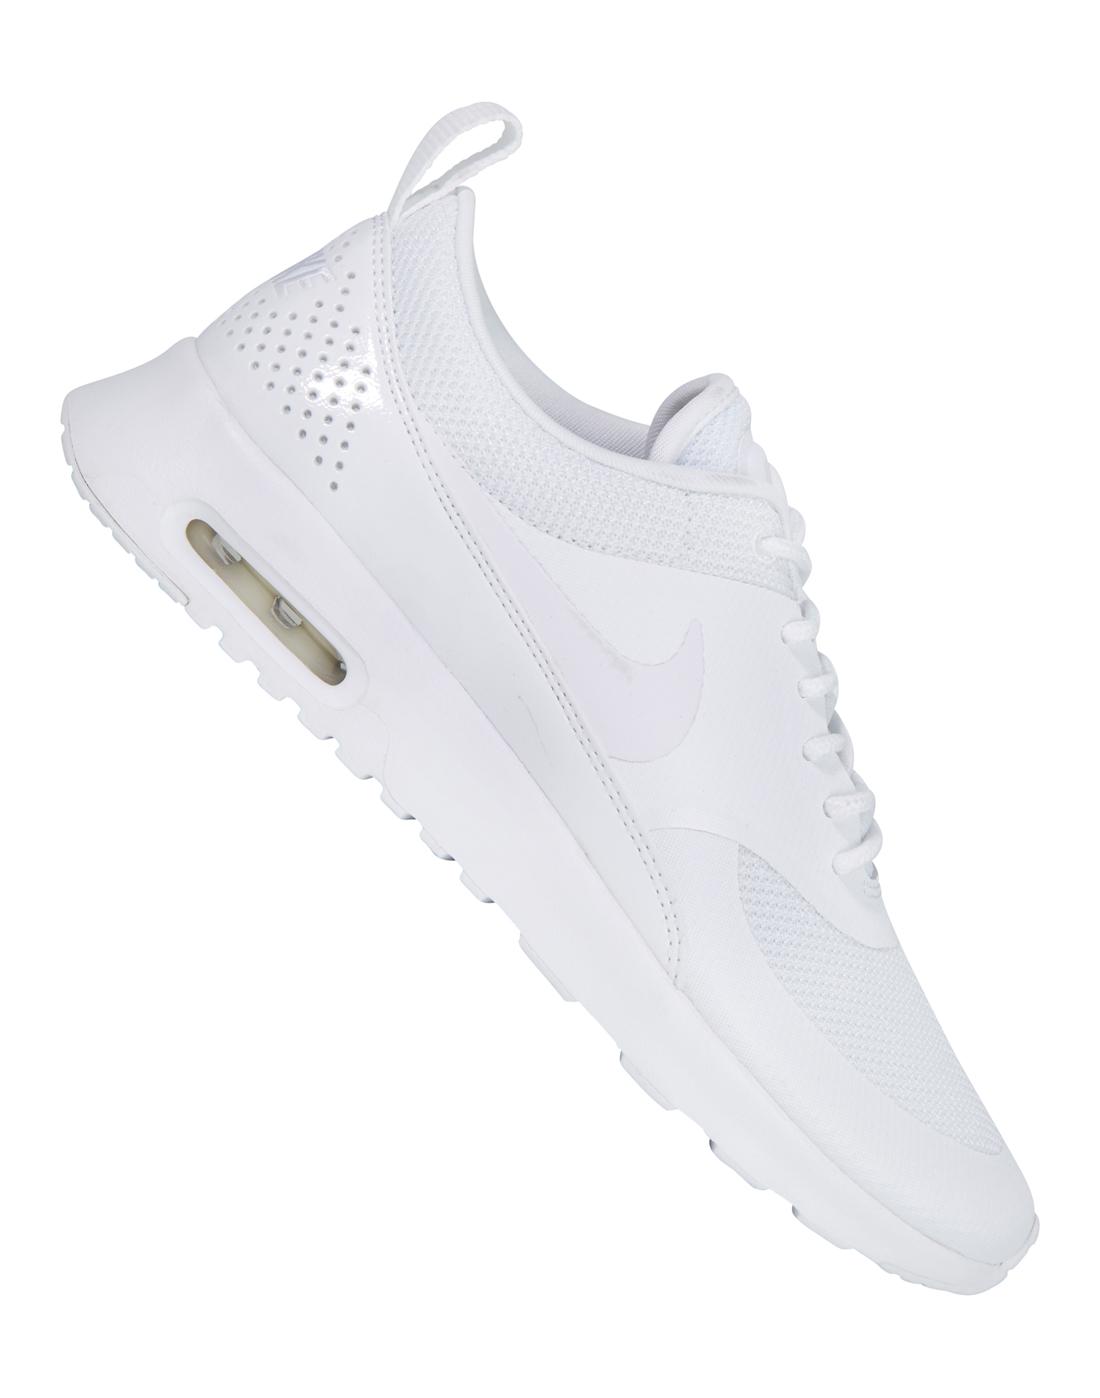 Sports Nike TheaWhite Max Air Life Womens Style jLARqc354